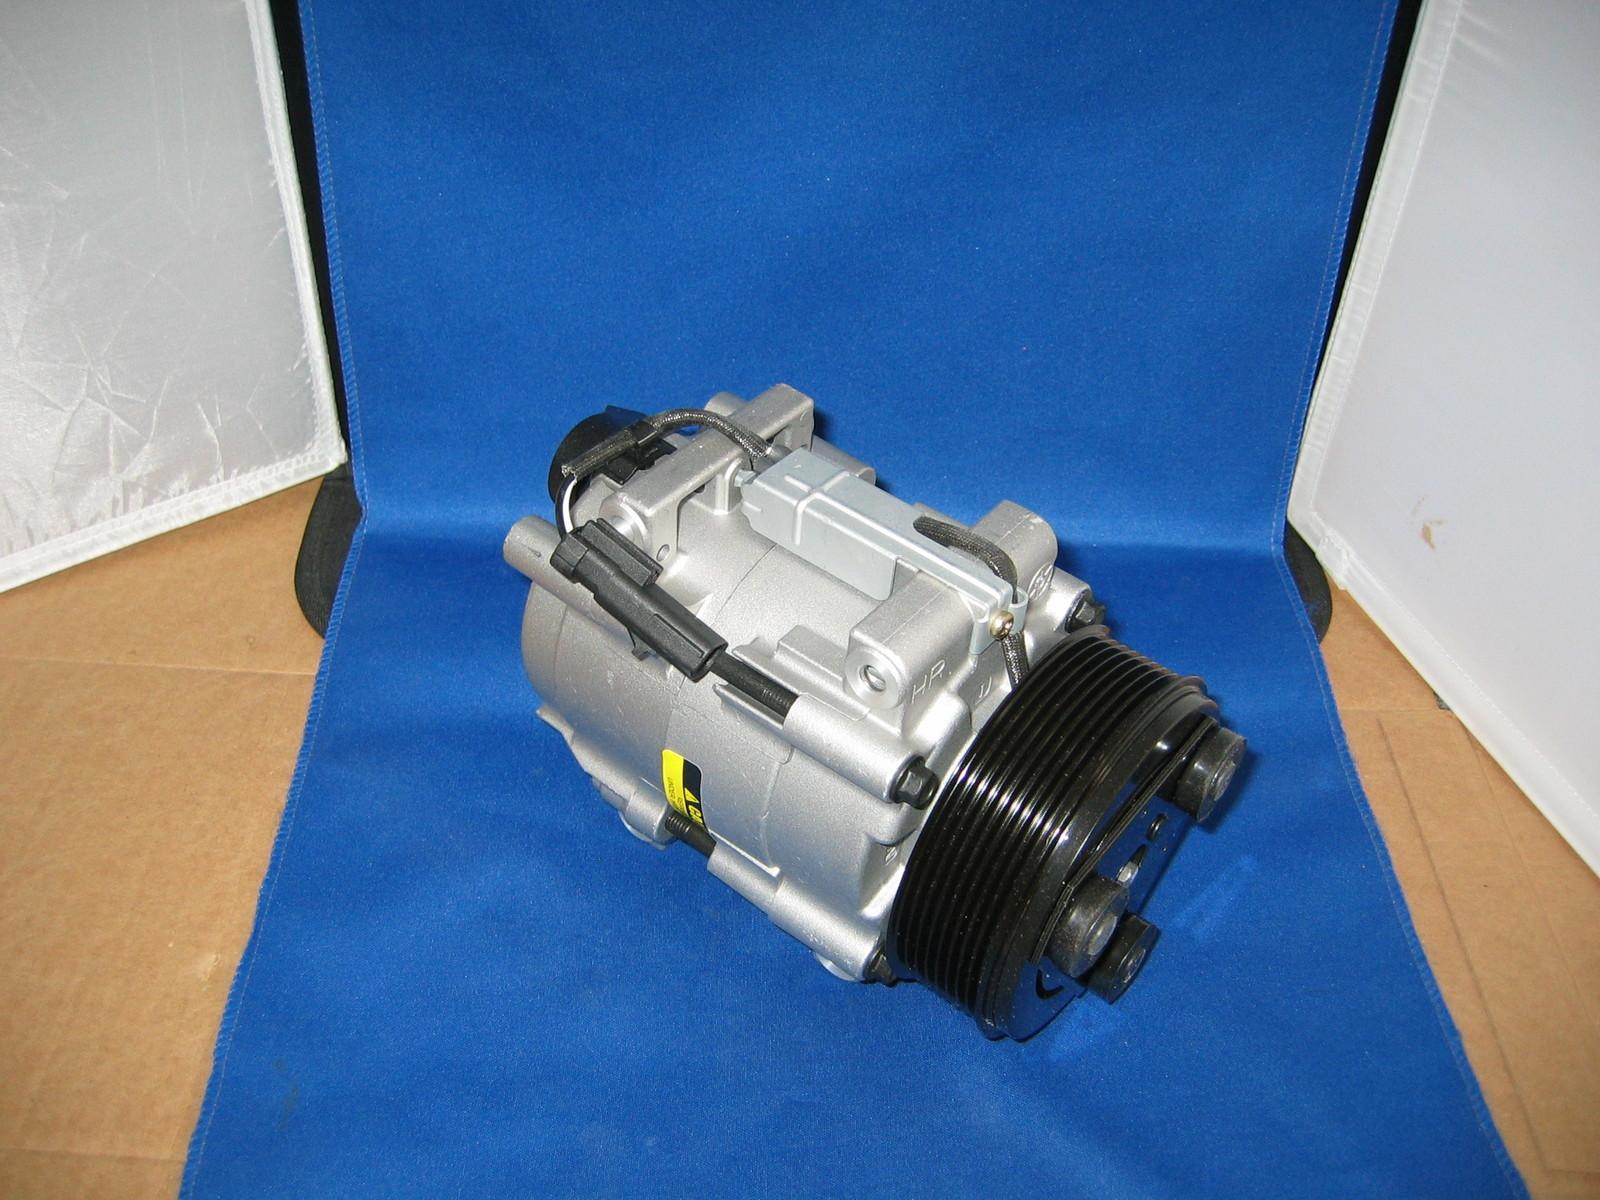 06-09 Dodge Ram 2500 6.7 Pickup AC Air Conditioning Compressor Repair Part Kit